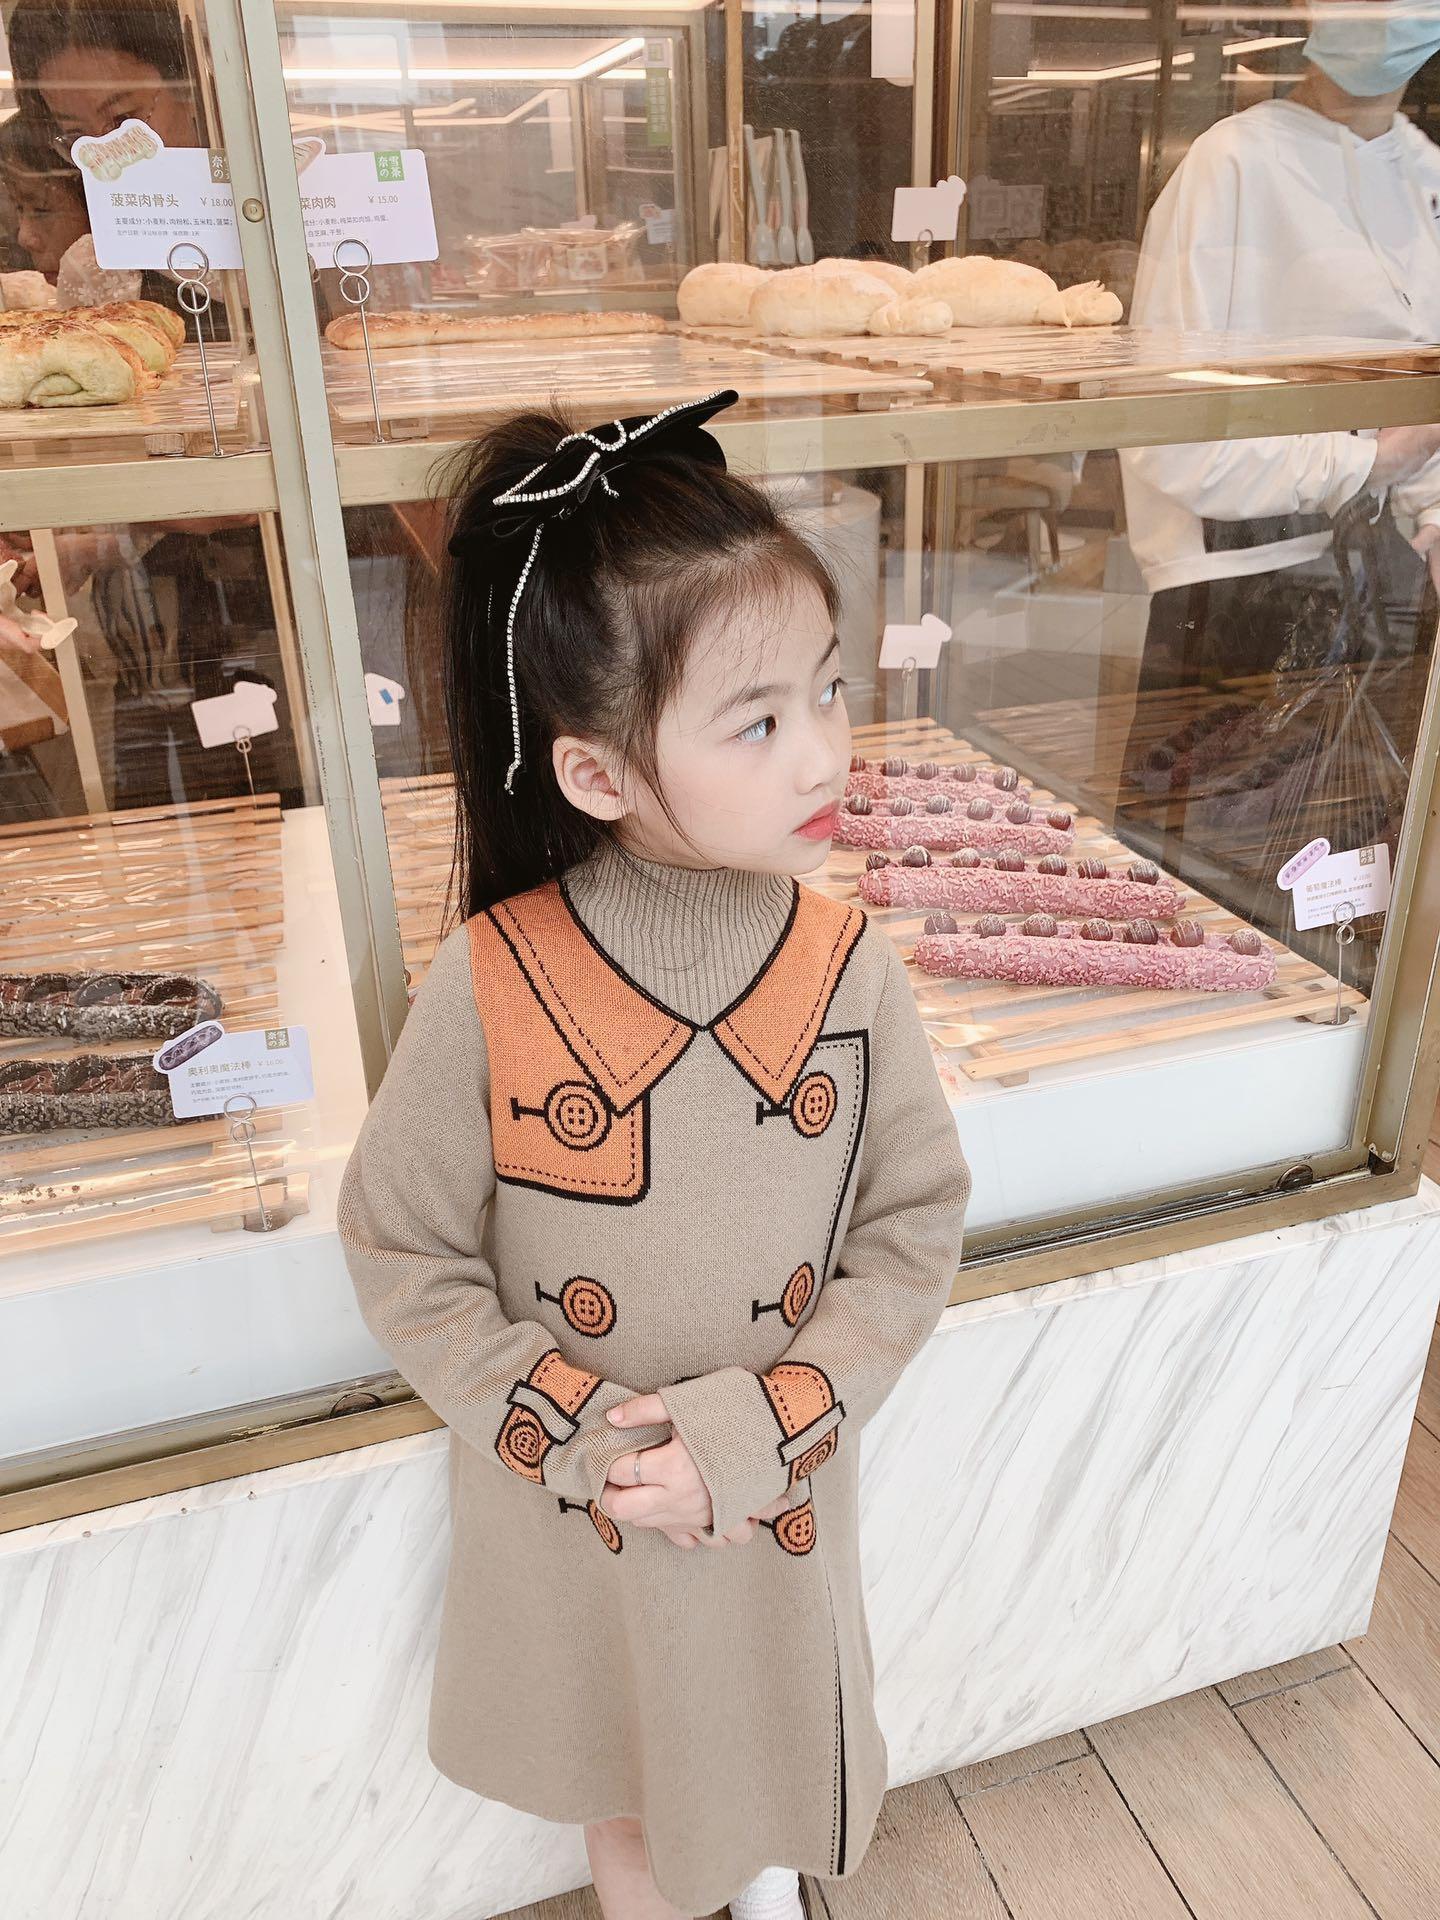 New Kids Meninas Sweater Dress Inverno Moda Doce Baby Girl Knit vestidos longos Criança Vestem roupas sólidos Tops